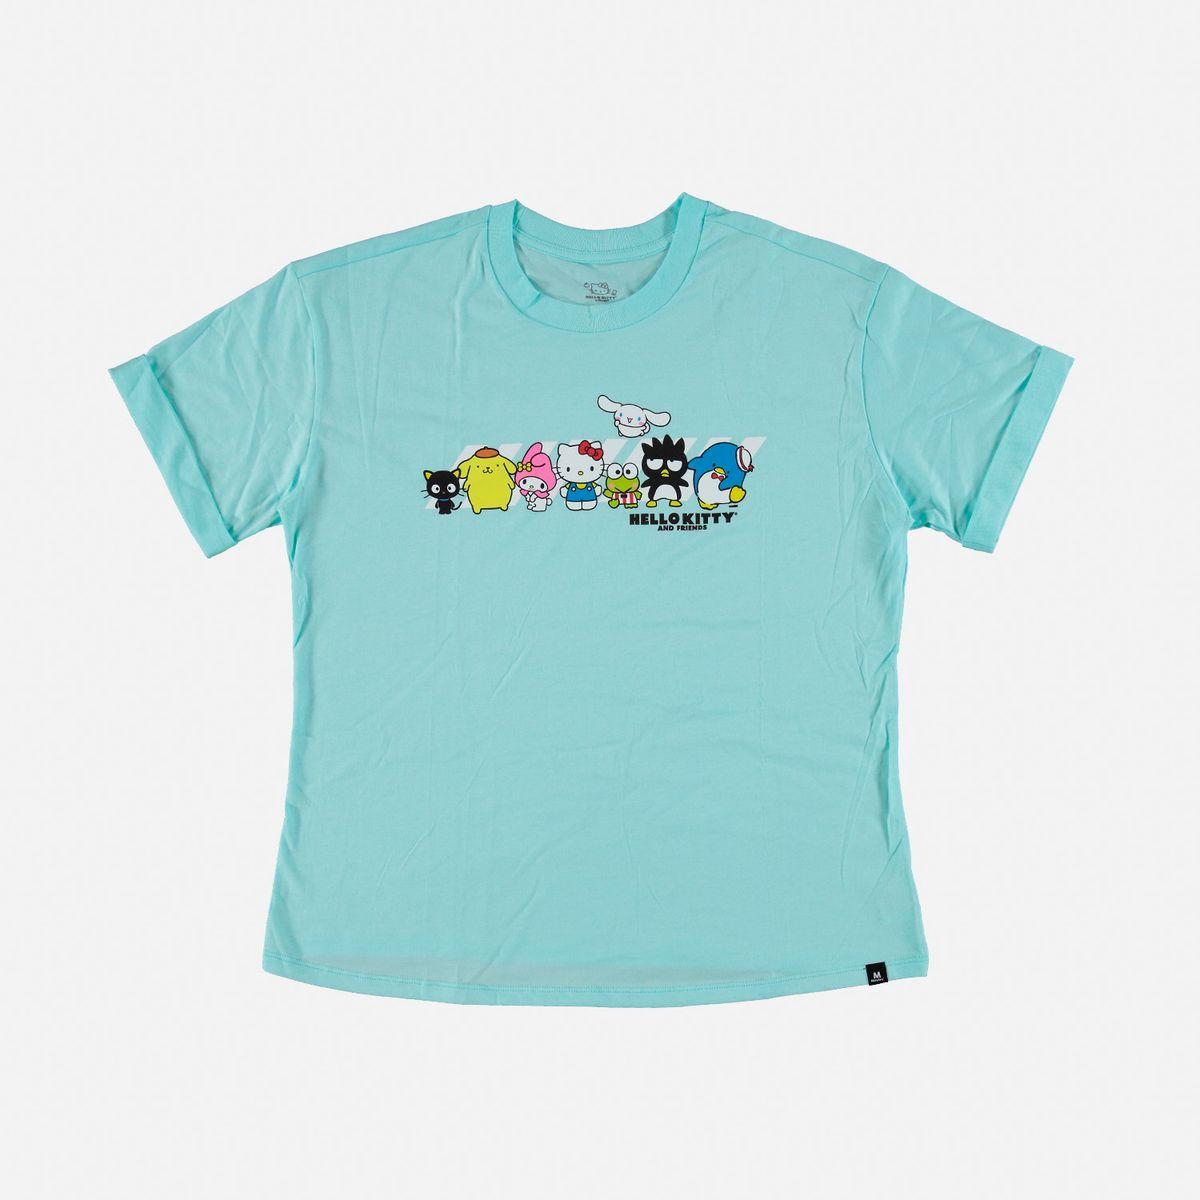 233689-camiseta-mujer-hello-kity-manga-corta-01